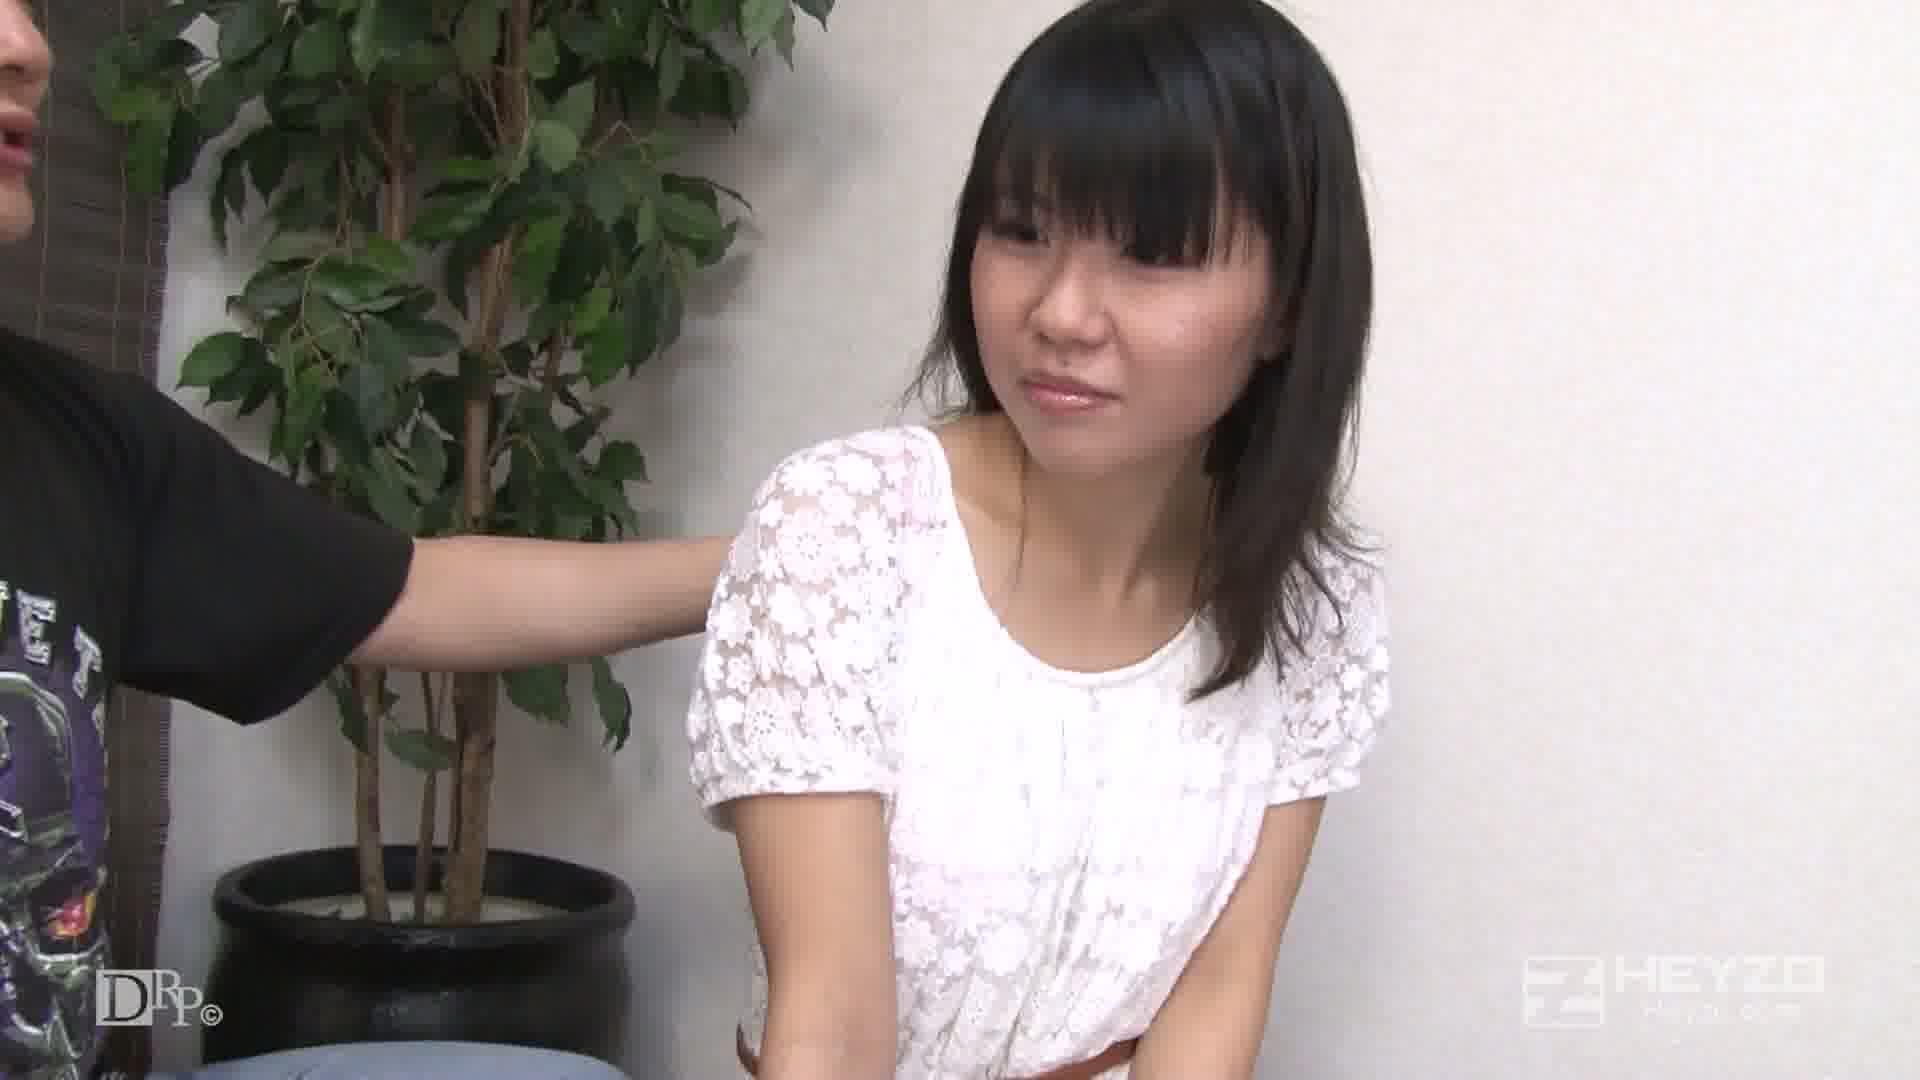 HEY!忘我 vol.2~志良玉弾吾が教える実践テクニック~ - なつみ【夫婦インタビュー 愛撫開始】